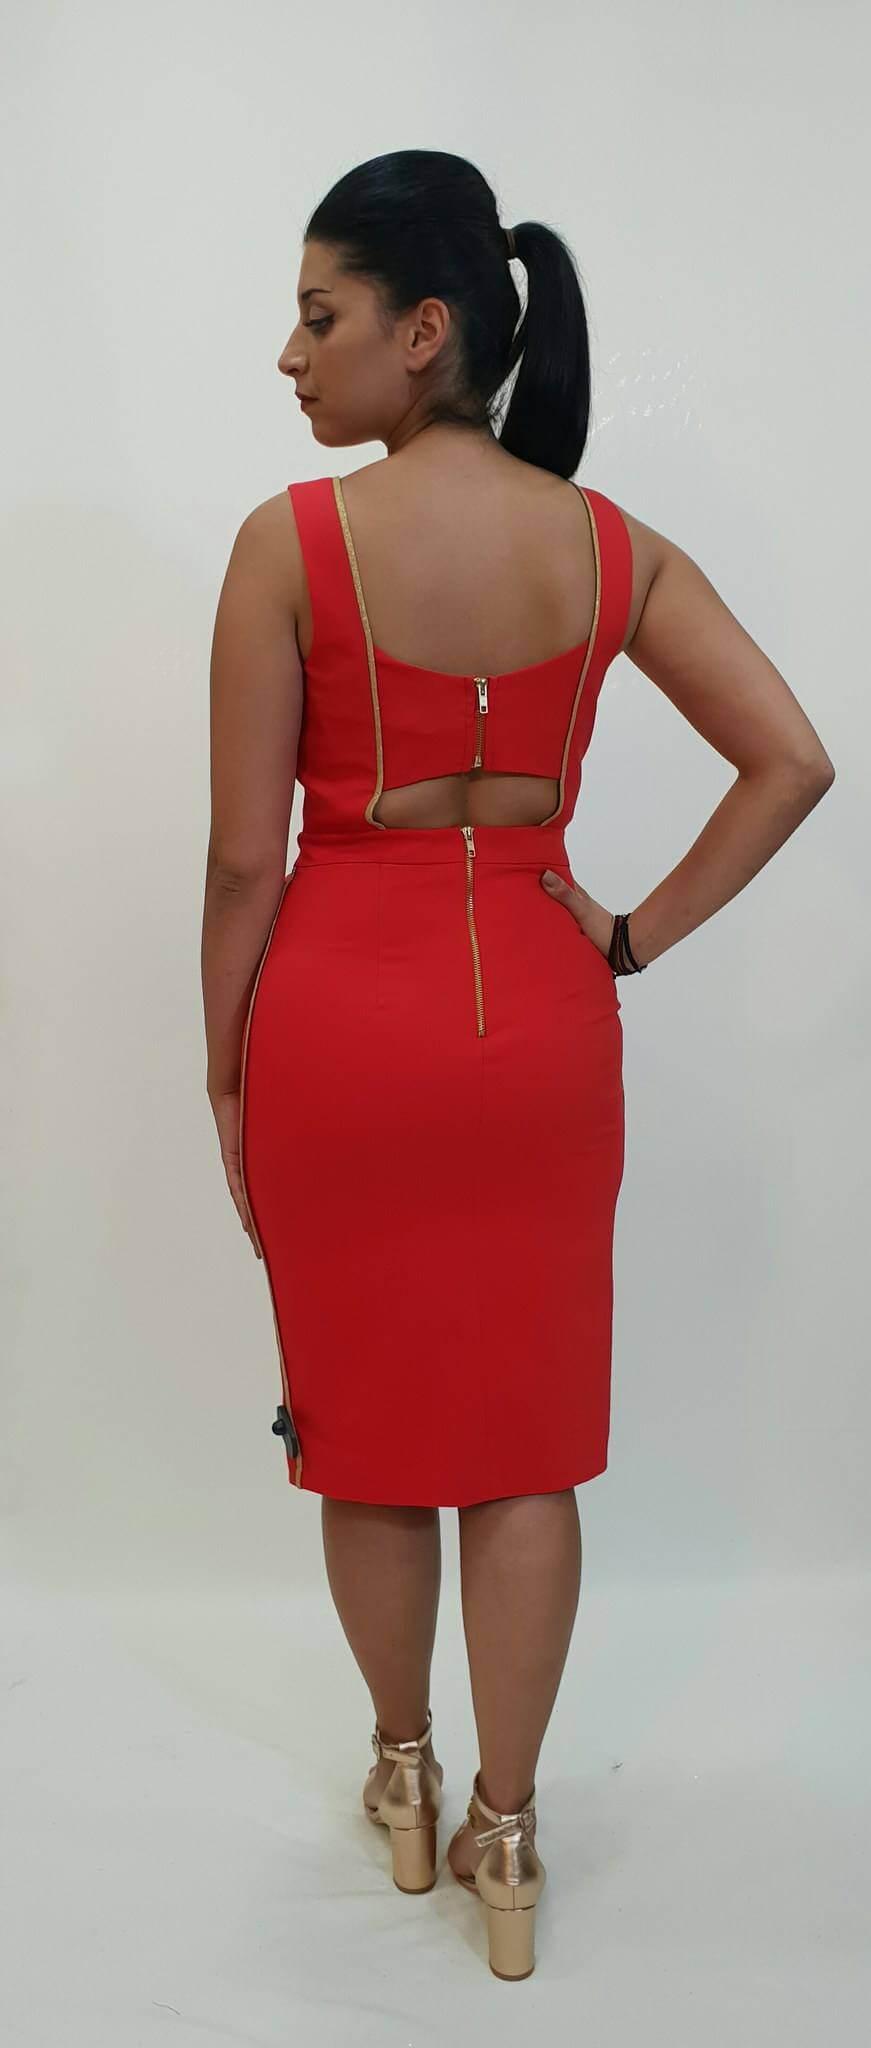 c62b08548766 Φόρεμα στενό ελαστικό - For ever Chania Clothing   Accessories